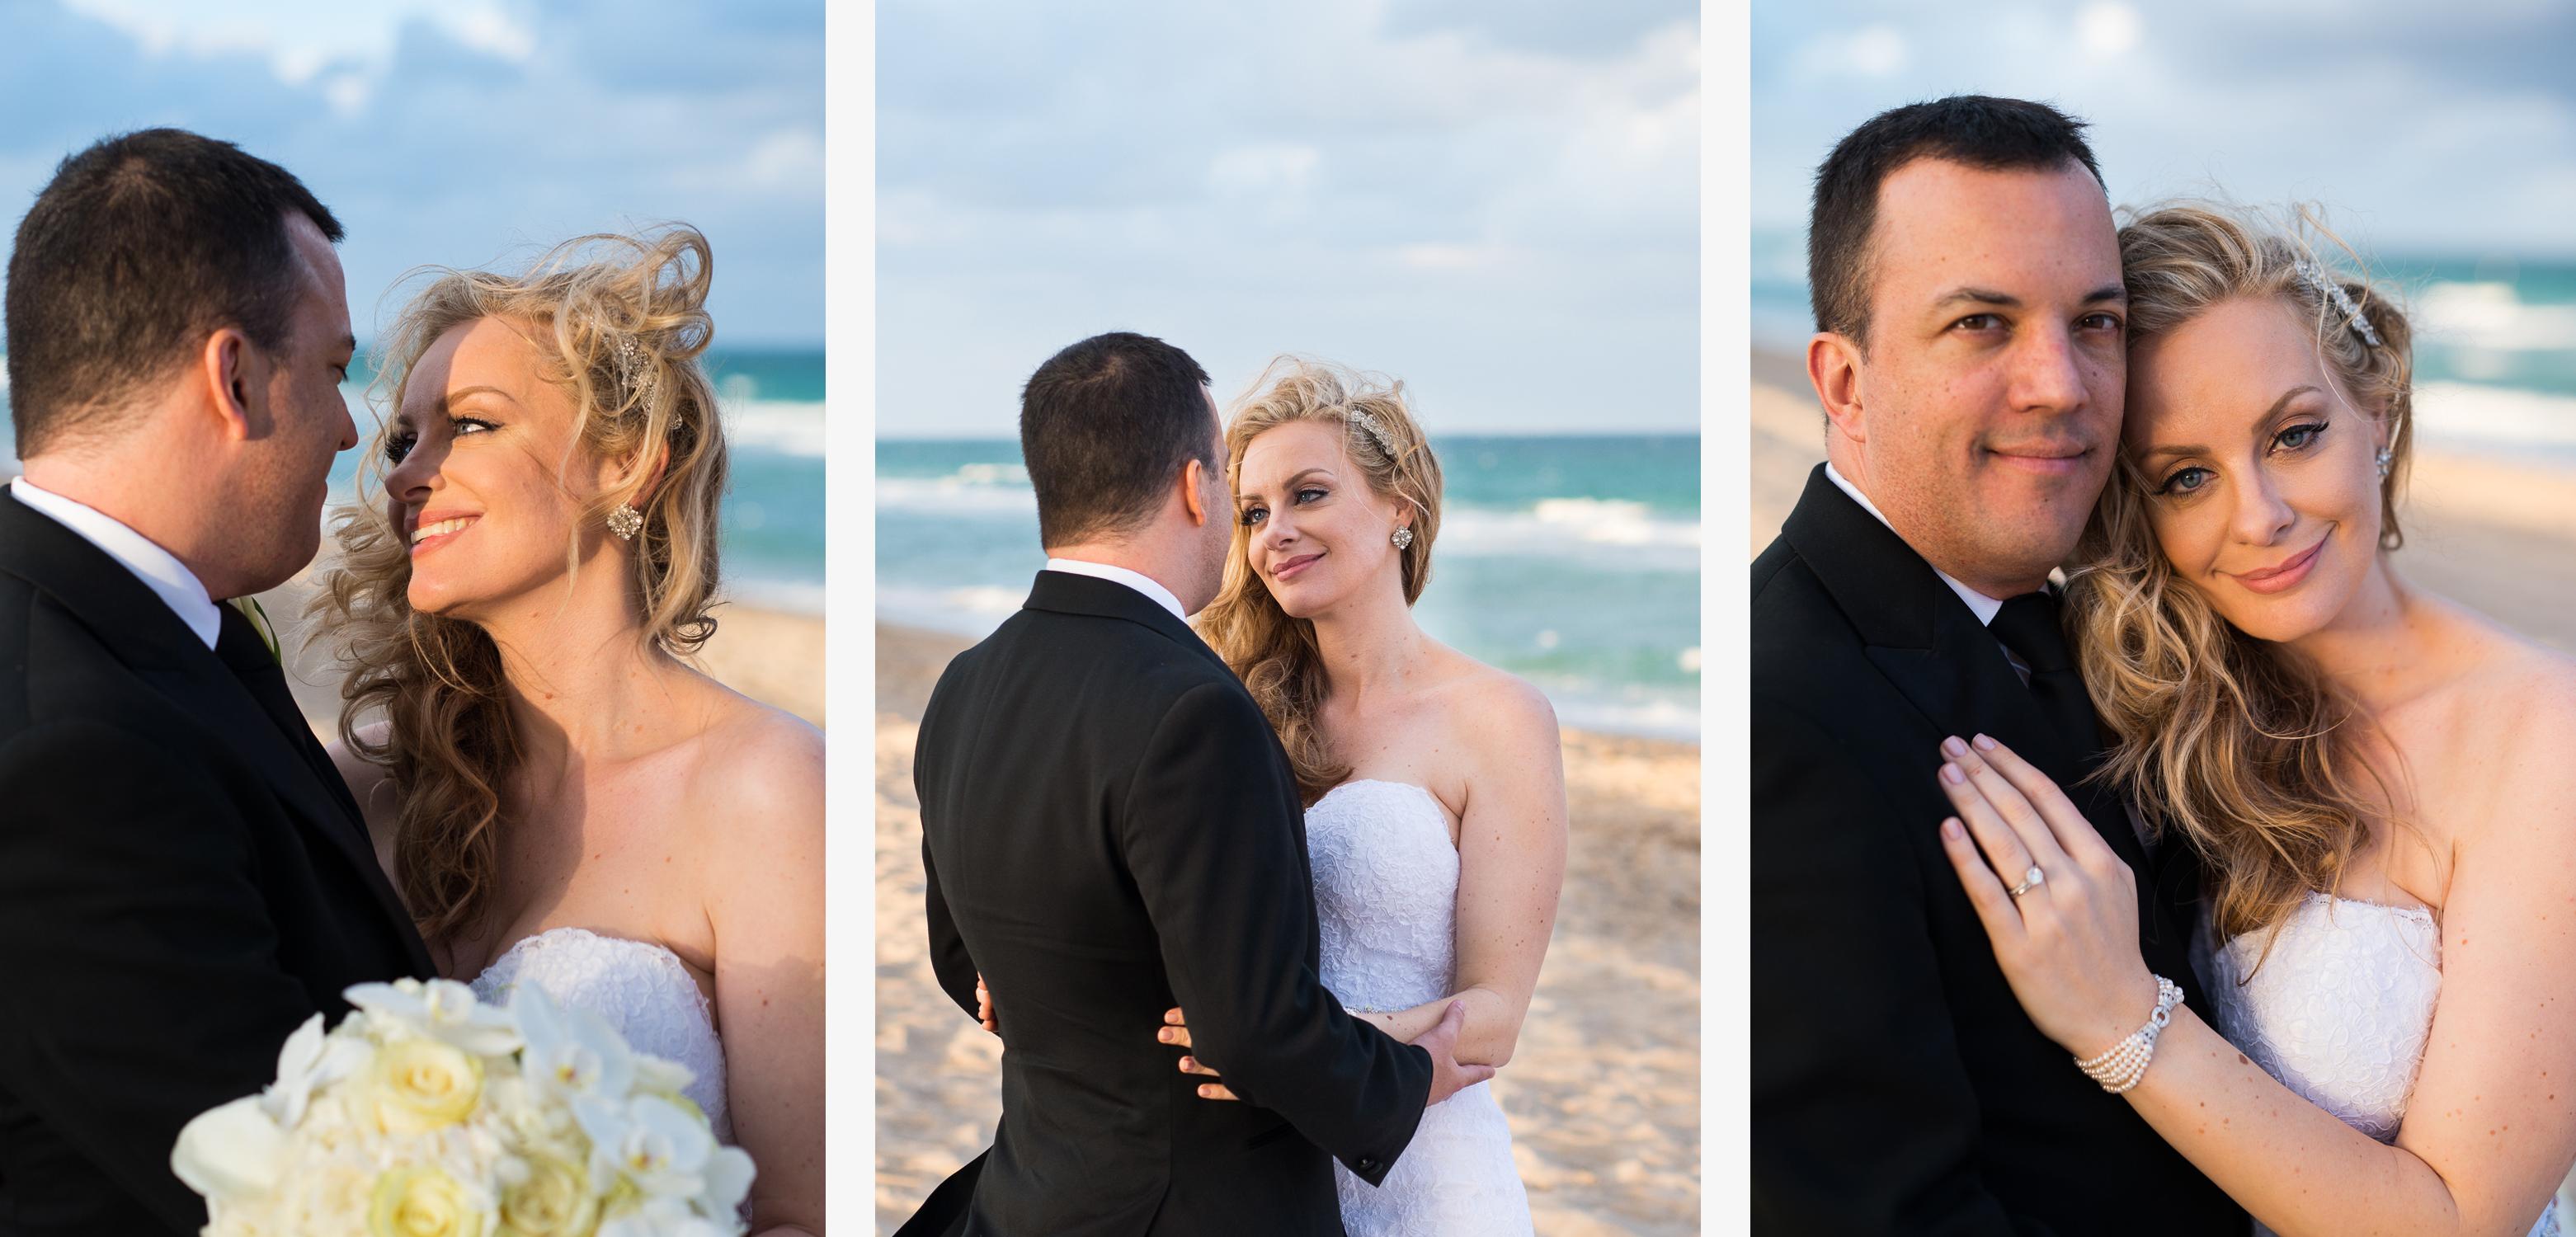 brandwold.se-miami-wedding-fortlauderdale-77